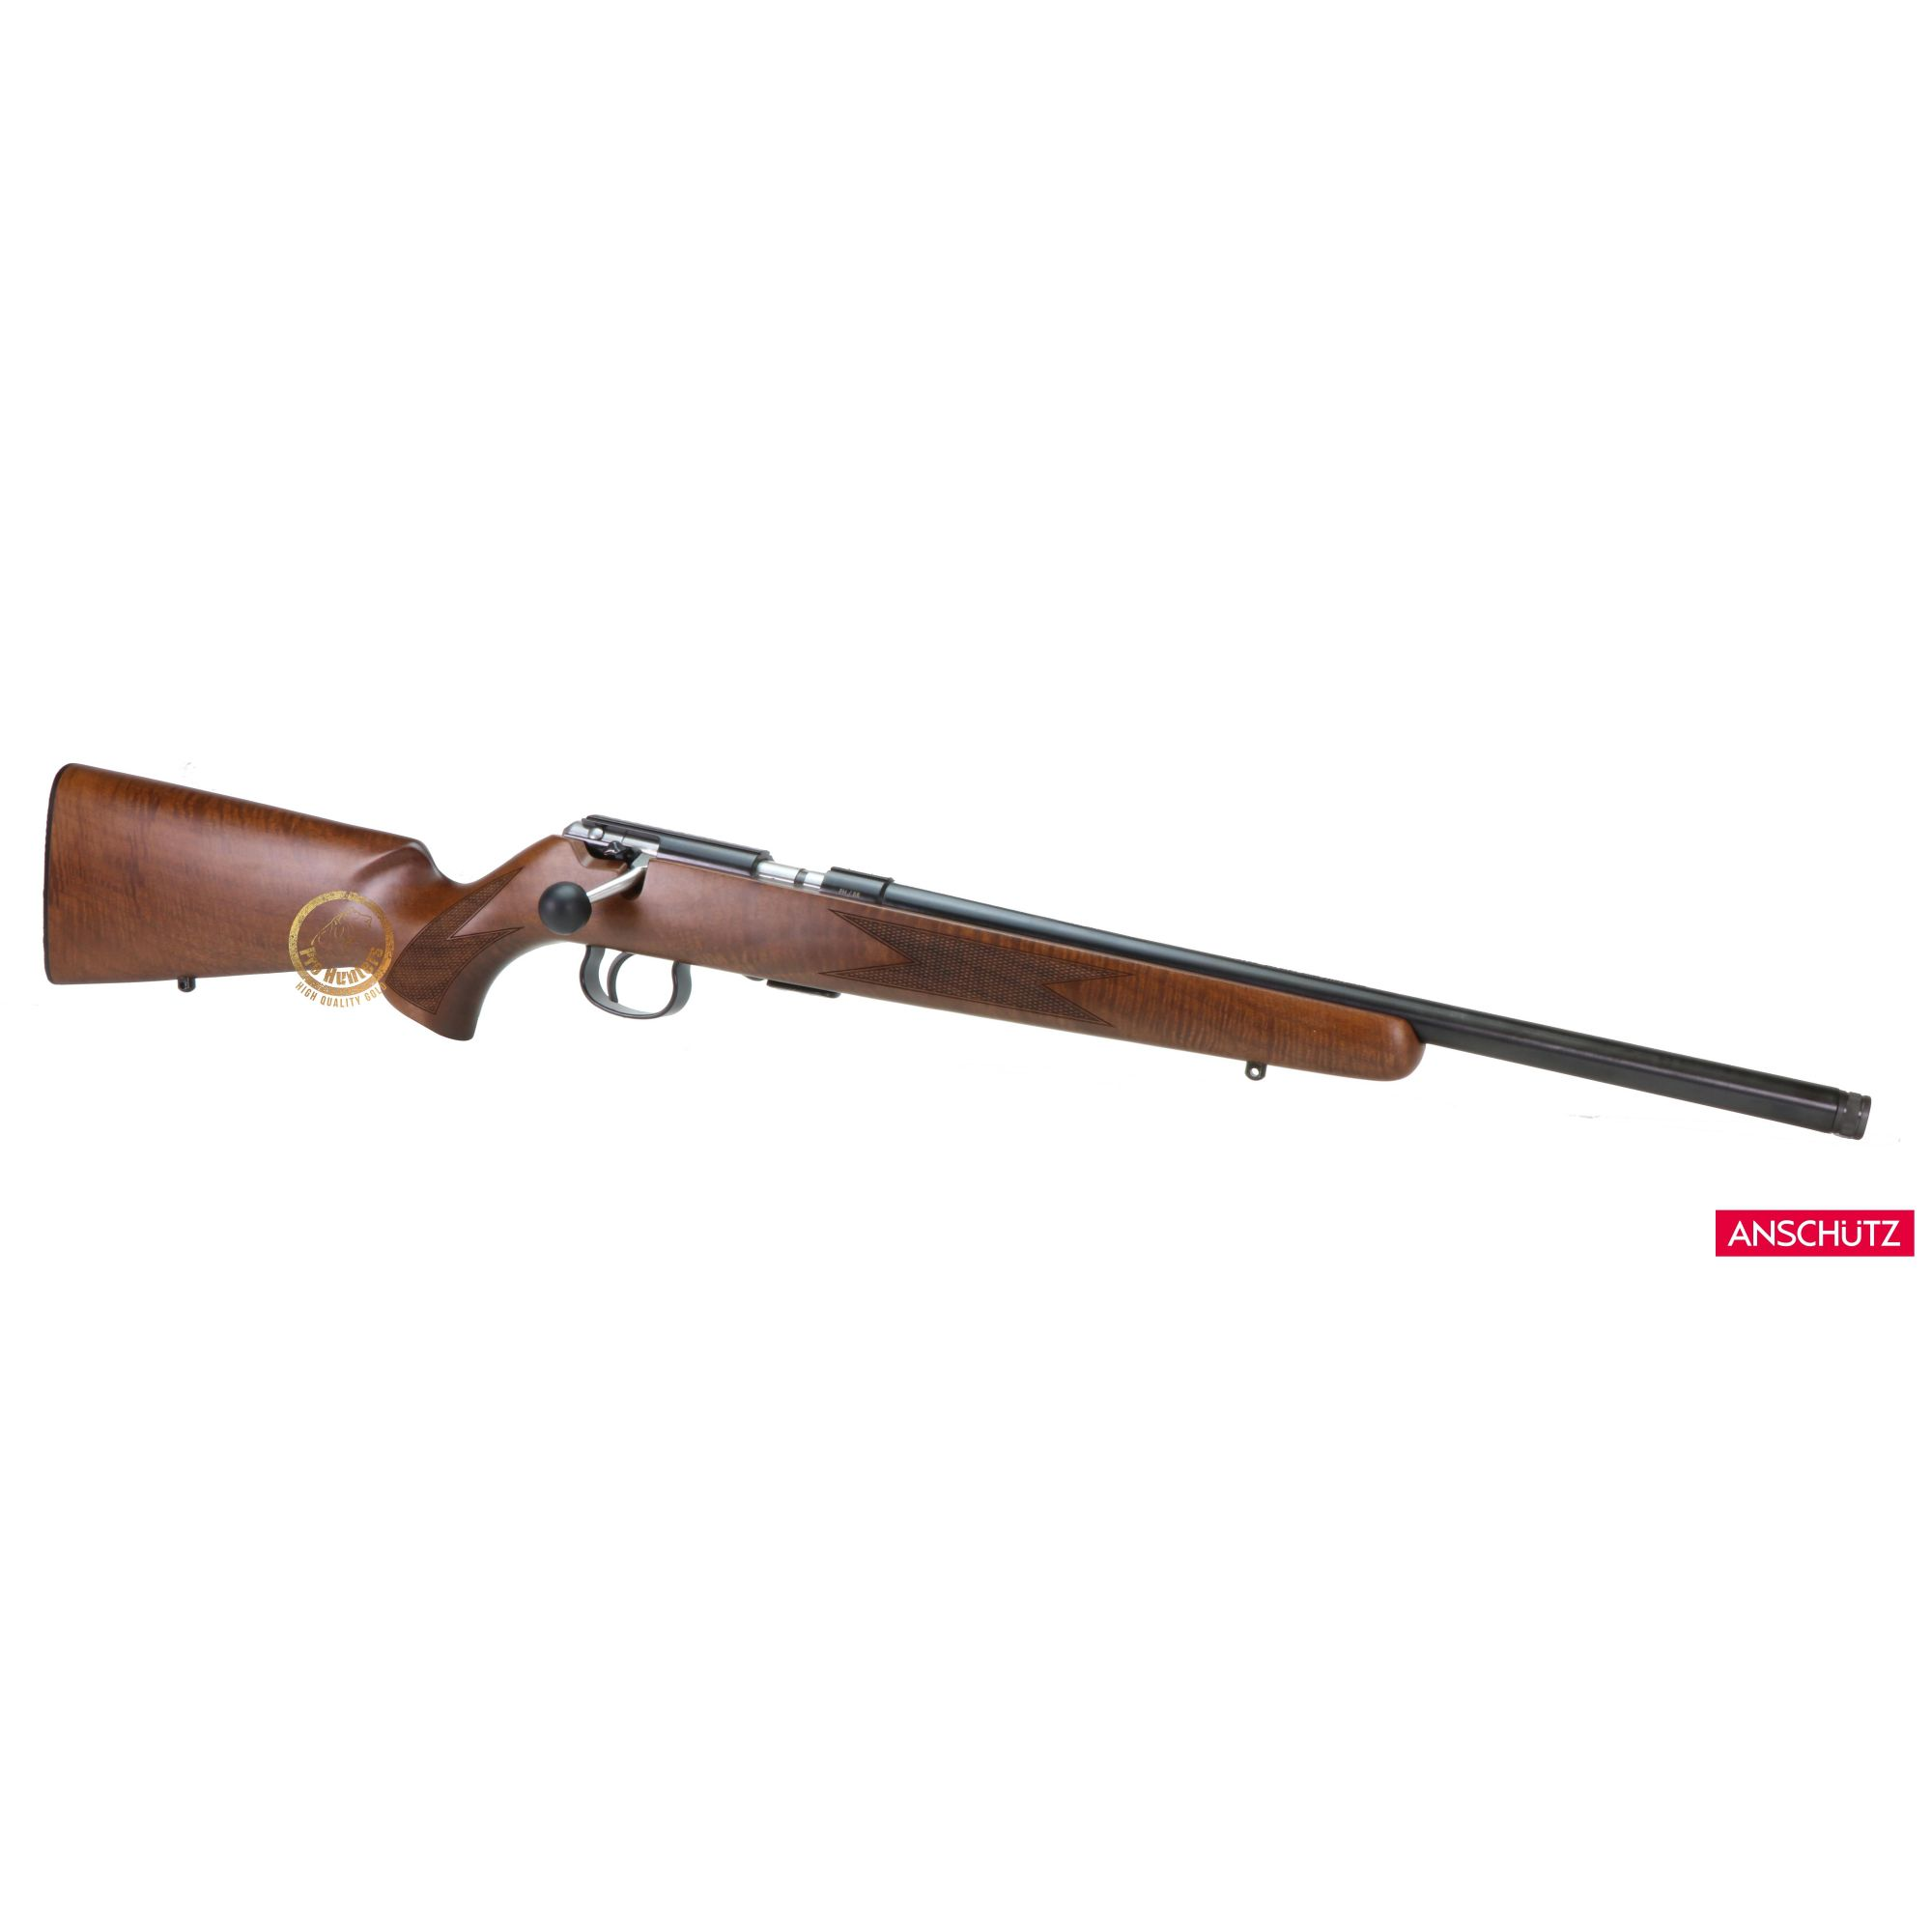 Rifle Anschutz 1416 D HB G Classic - Cano 18